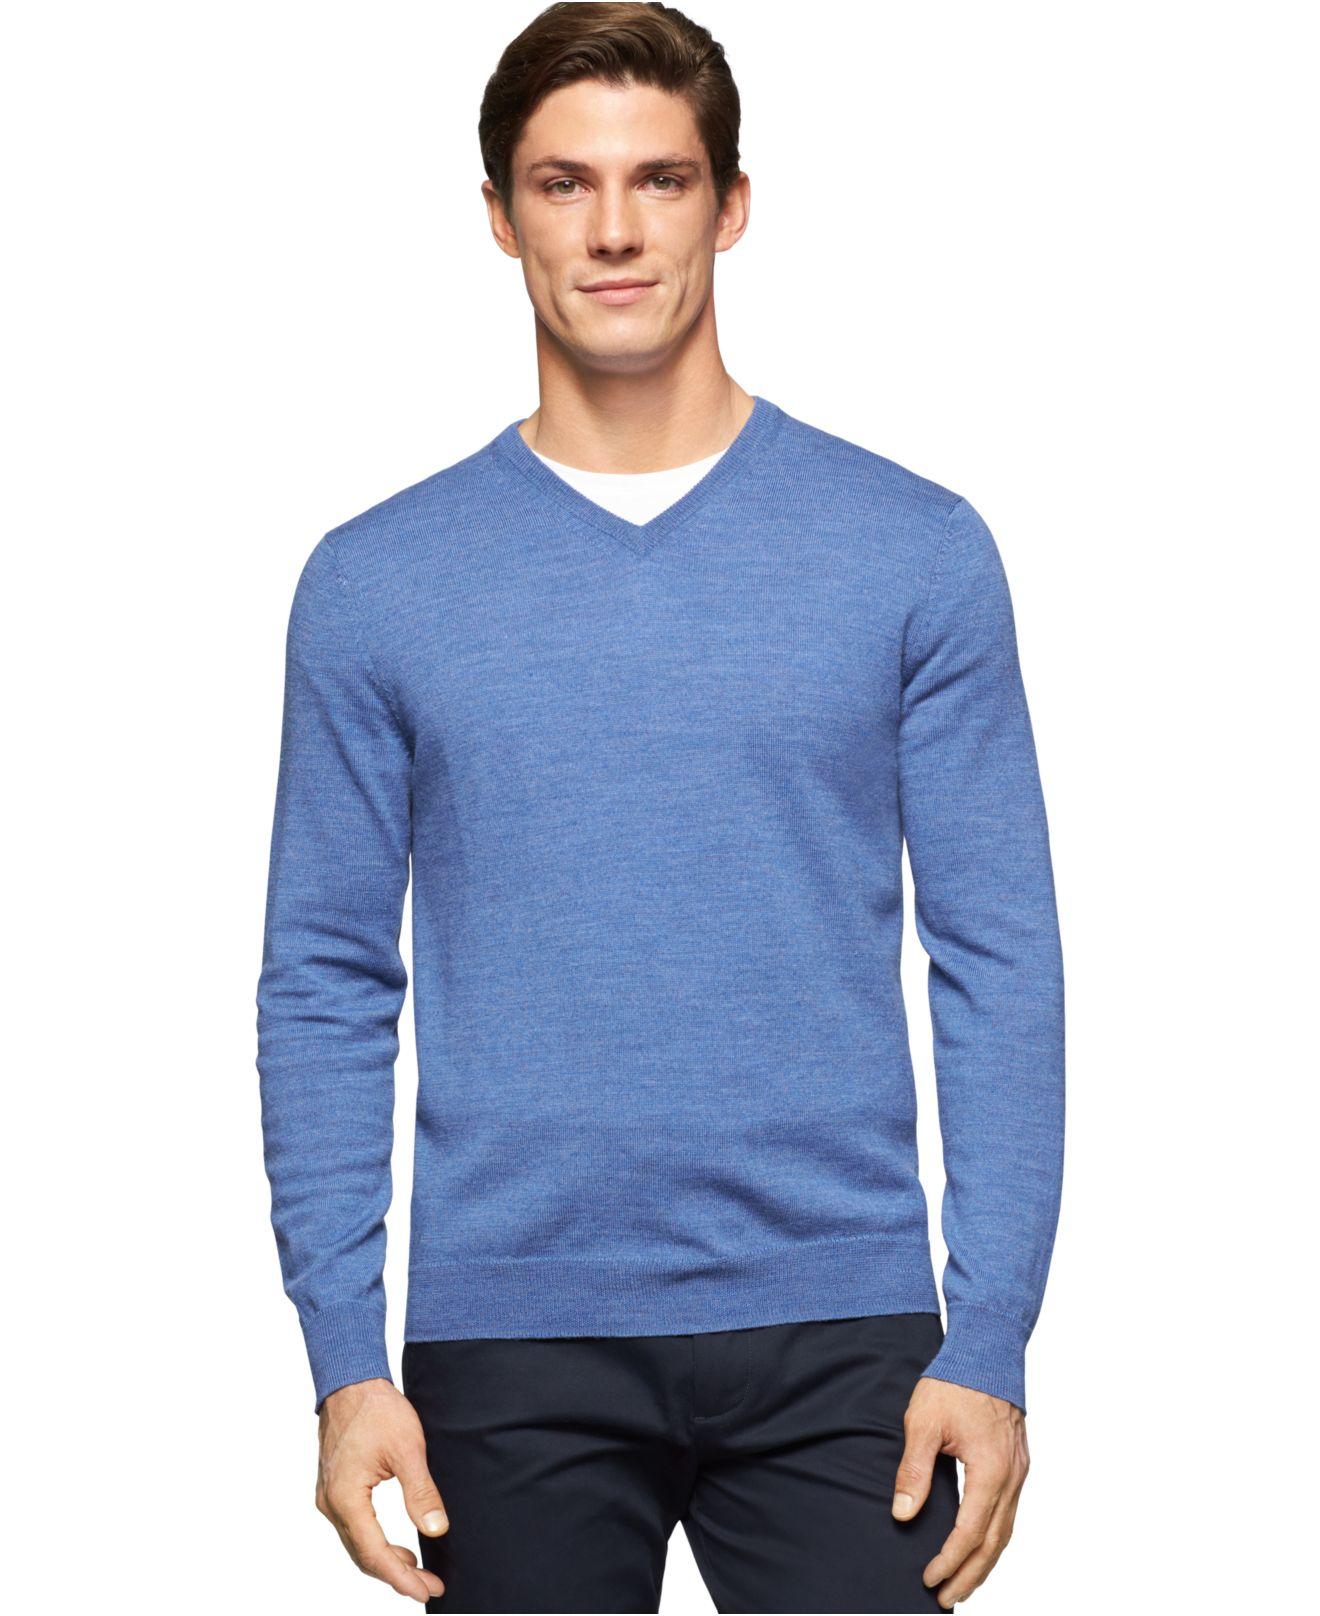 calvin klein merino wool v neck sweater in blue for men lyst. Black Bedroom Furniture Sets. Home Design Ideas